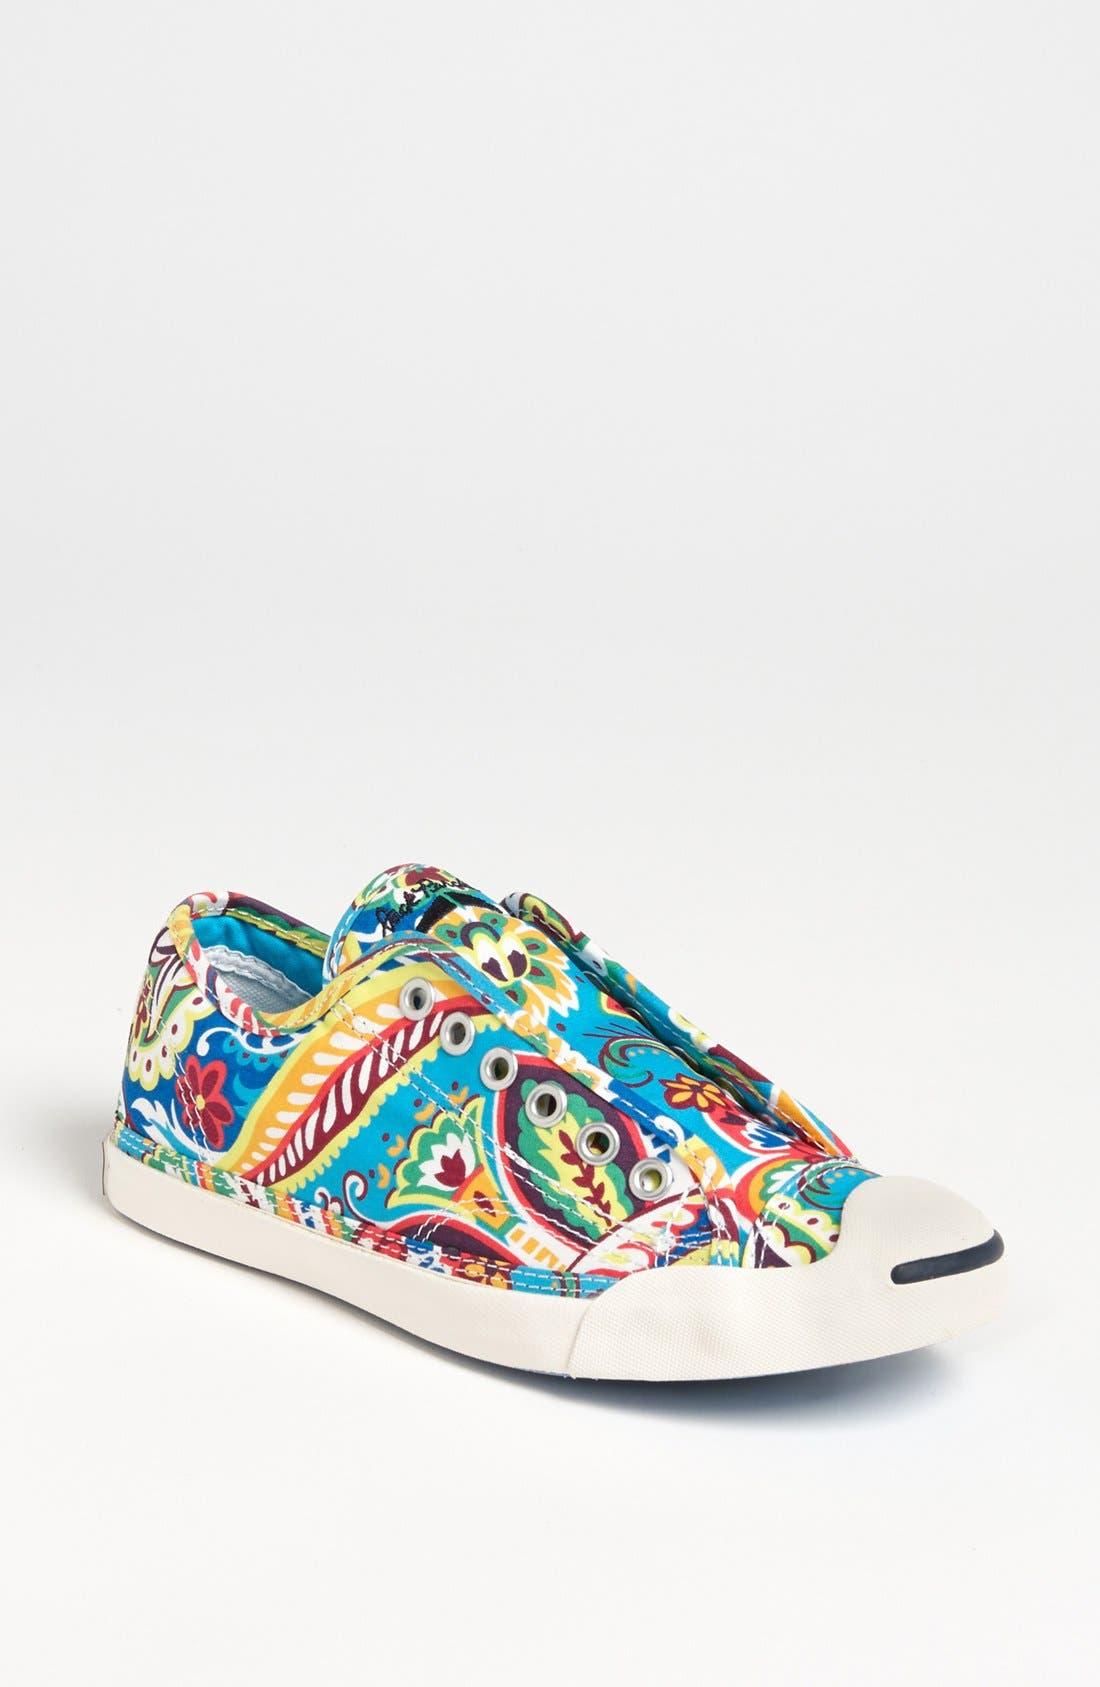 Alternate Image 1 Selected - Converse 'Jack Purcell LP' Slip-On Sneaker (Women)